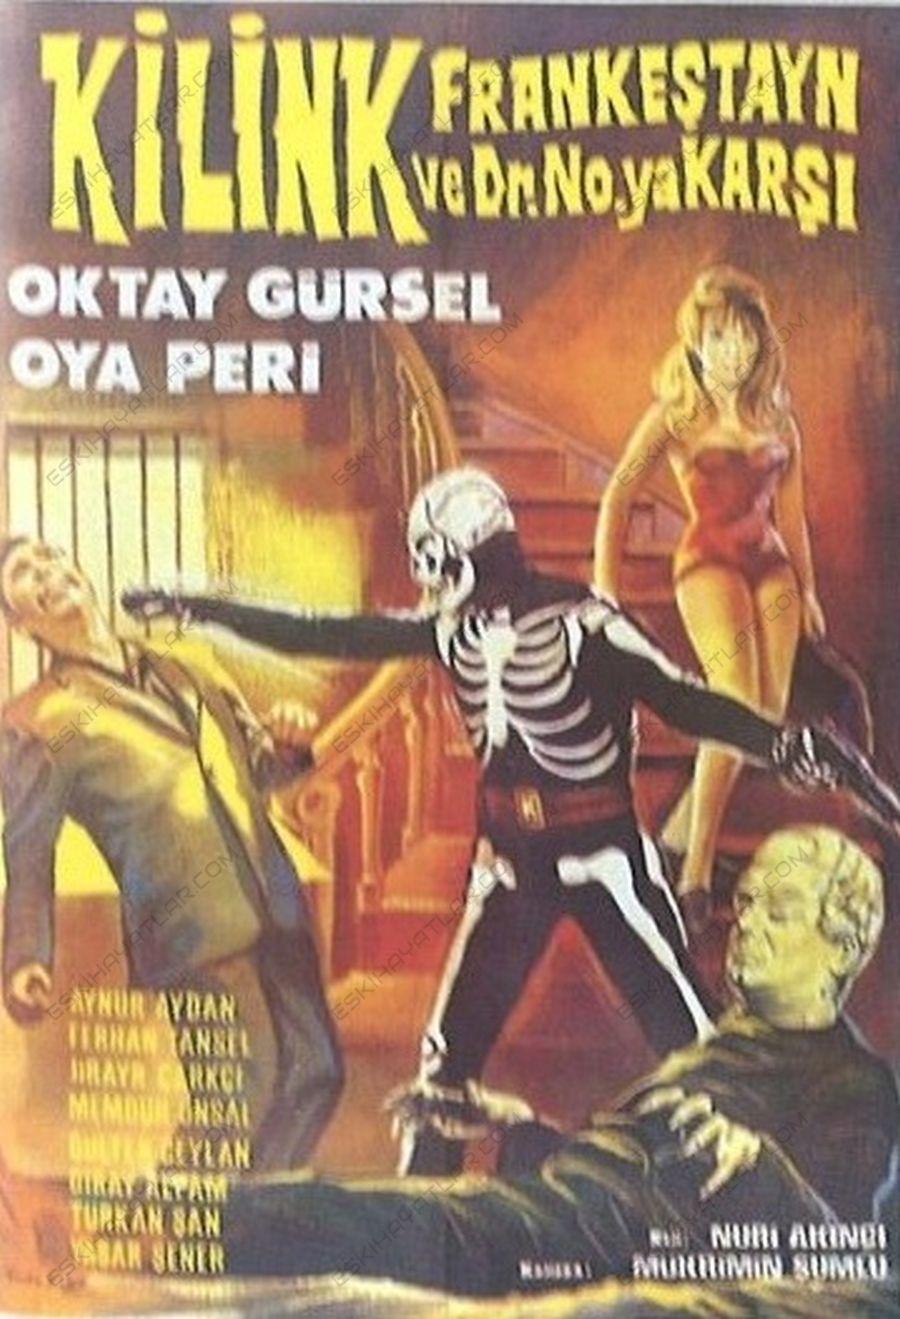 0338-kilink-ucan-adama-karsi-yilmaz-atadeniz-kimdir-kilink-soy-ve-oldur-kilink-istanbulda-kilink-film-afisi (3)